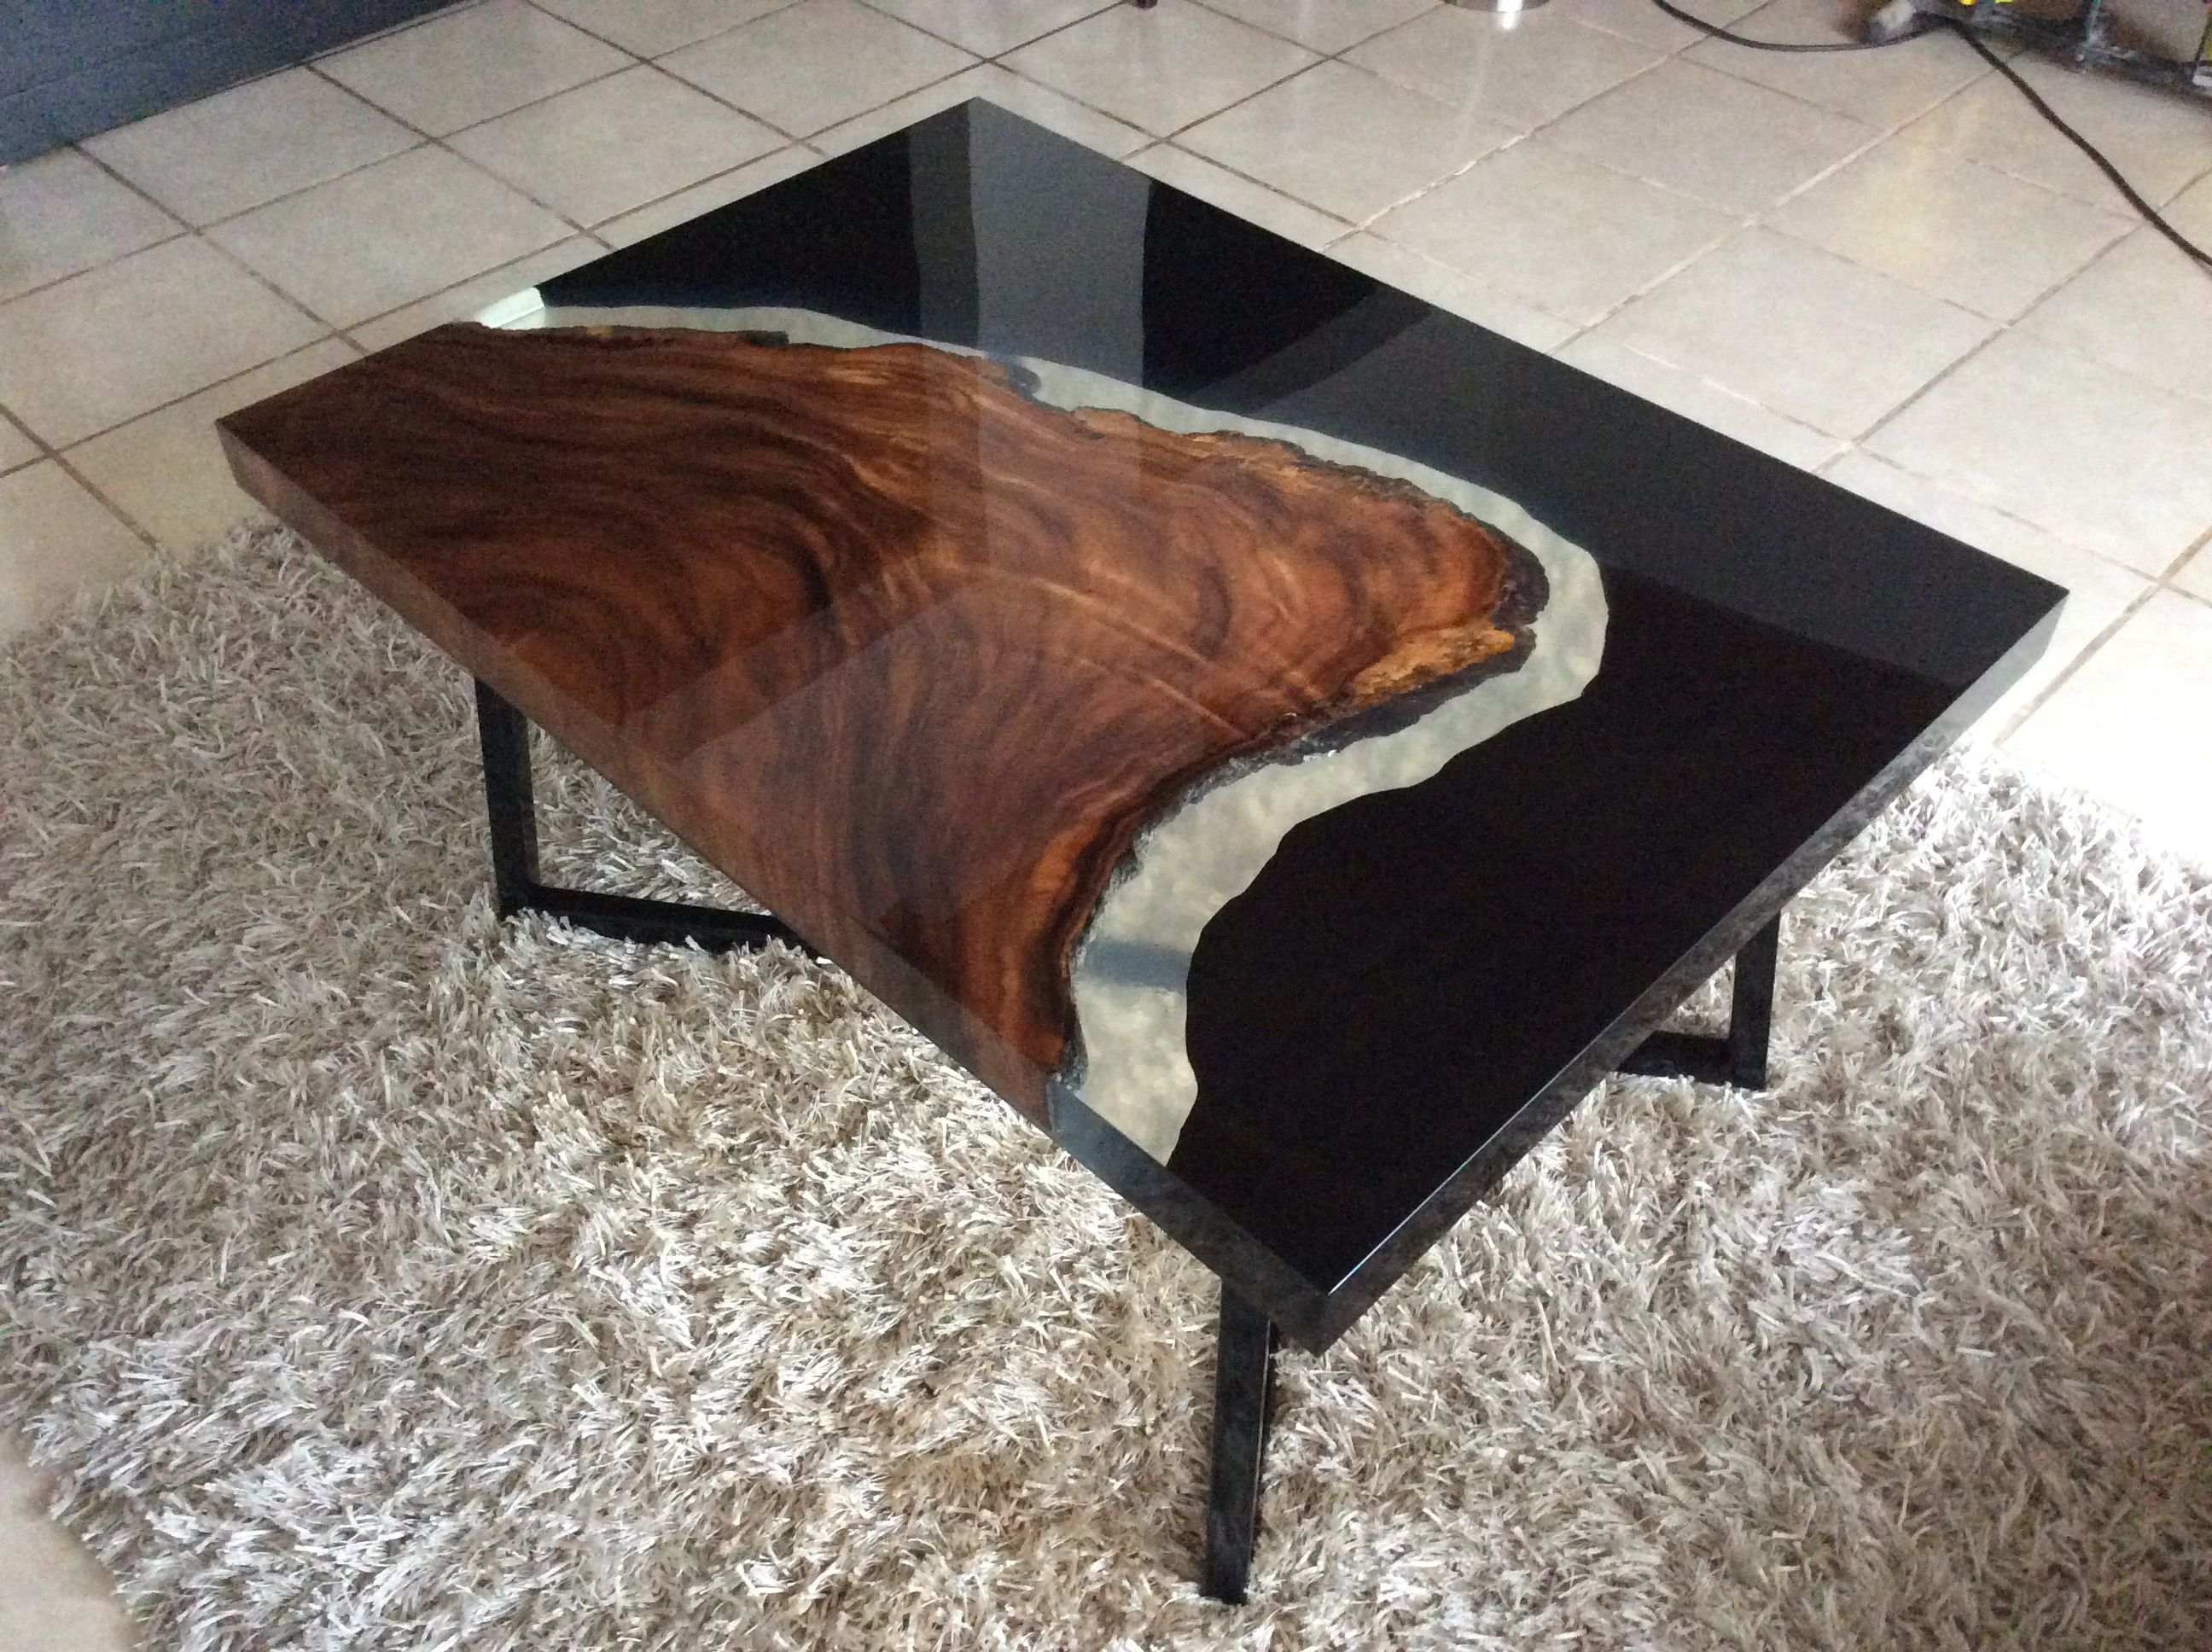 Coffee Table Cenizaro Wood And Black Resin Artist Konrad Sasso Costa Rica Wood Resin Table Wood Table Design Resin Furniture [ 1936 x 2592 Pixel ]